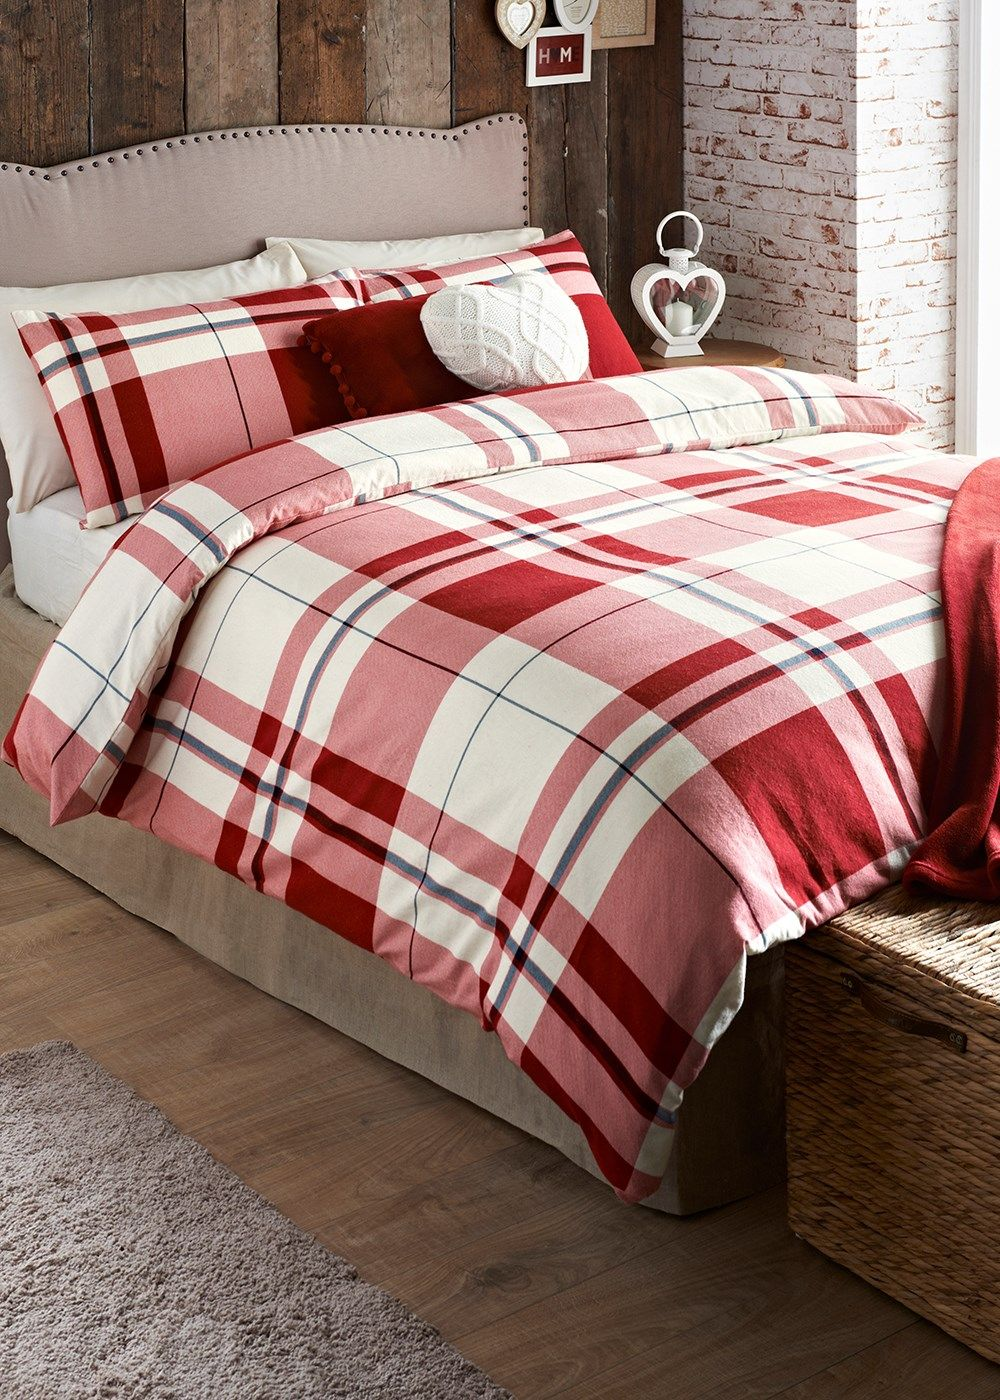 Heritage Check Print Brushed Cotton Bedding Set Matalan Bedroom - Matalan bedroom furniture